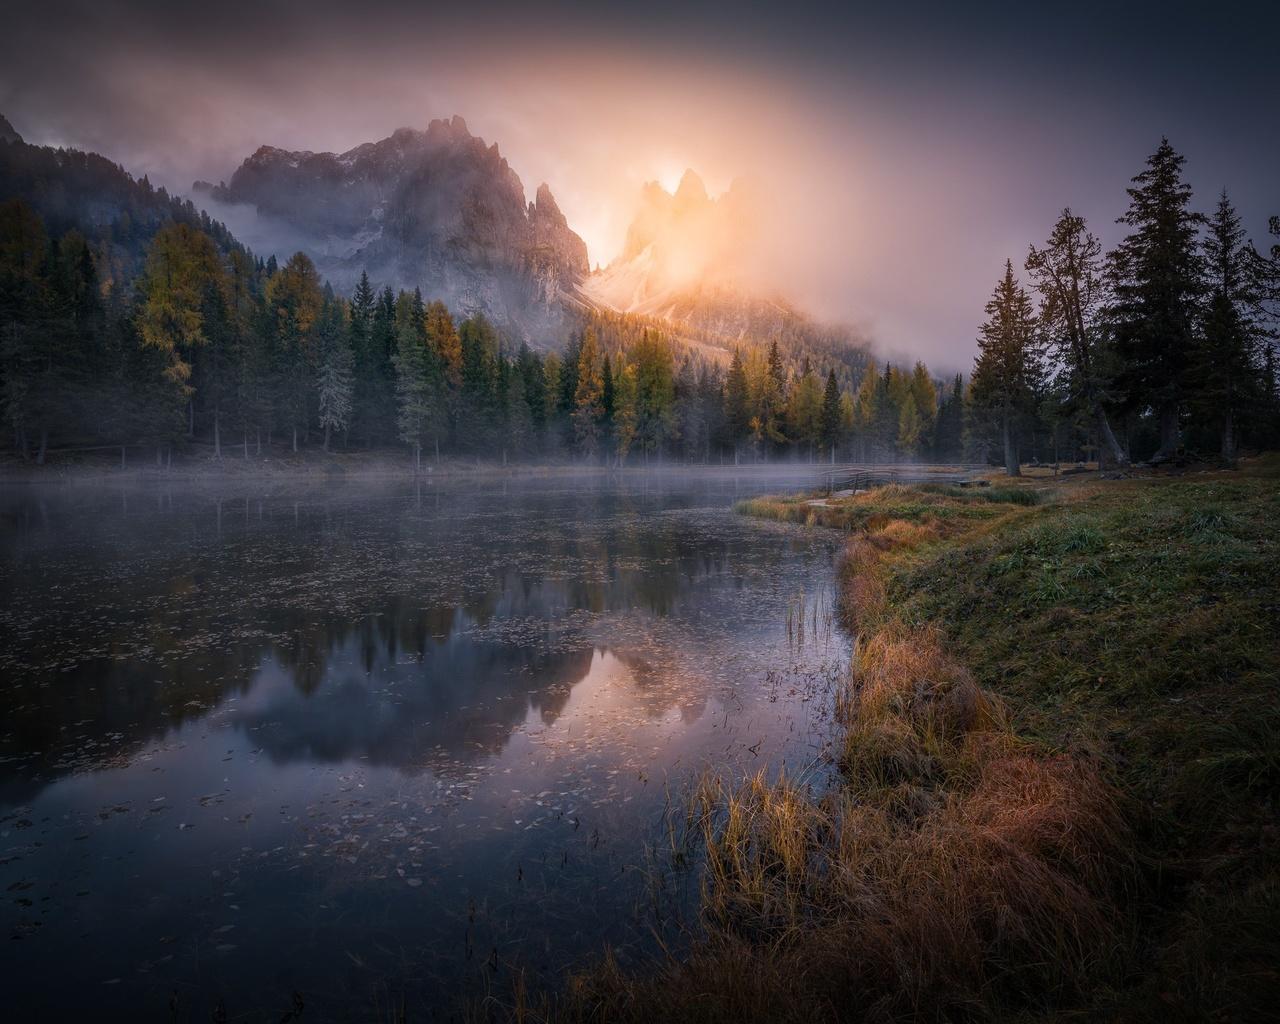 горы, деревья, туман, восход, река, утро